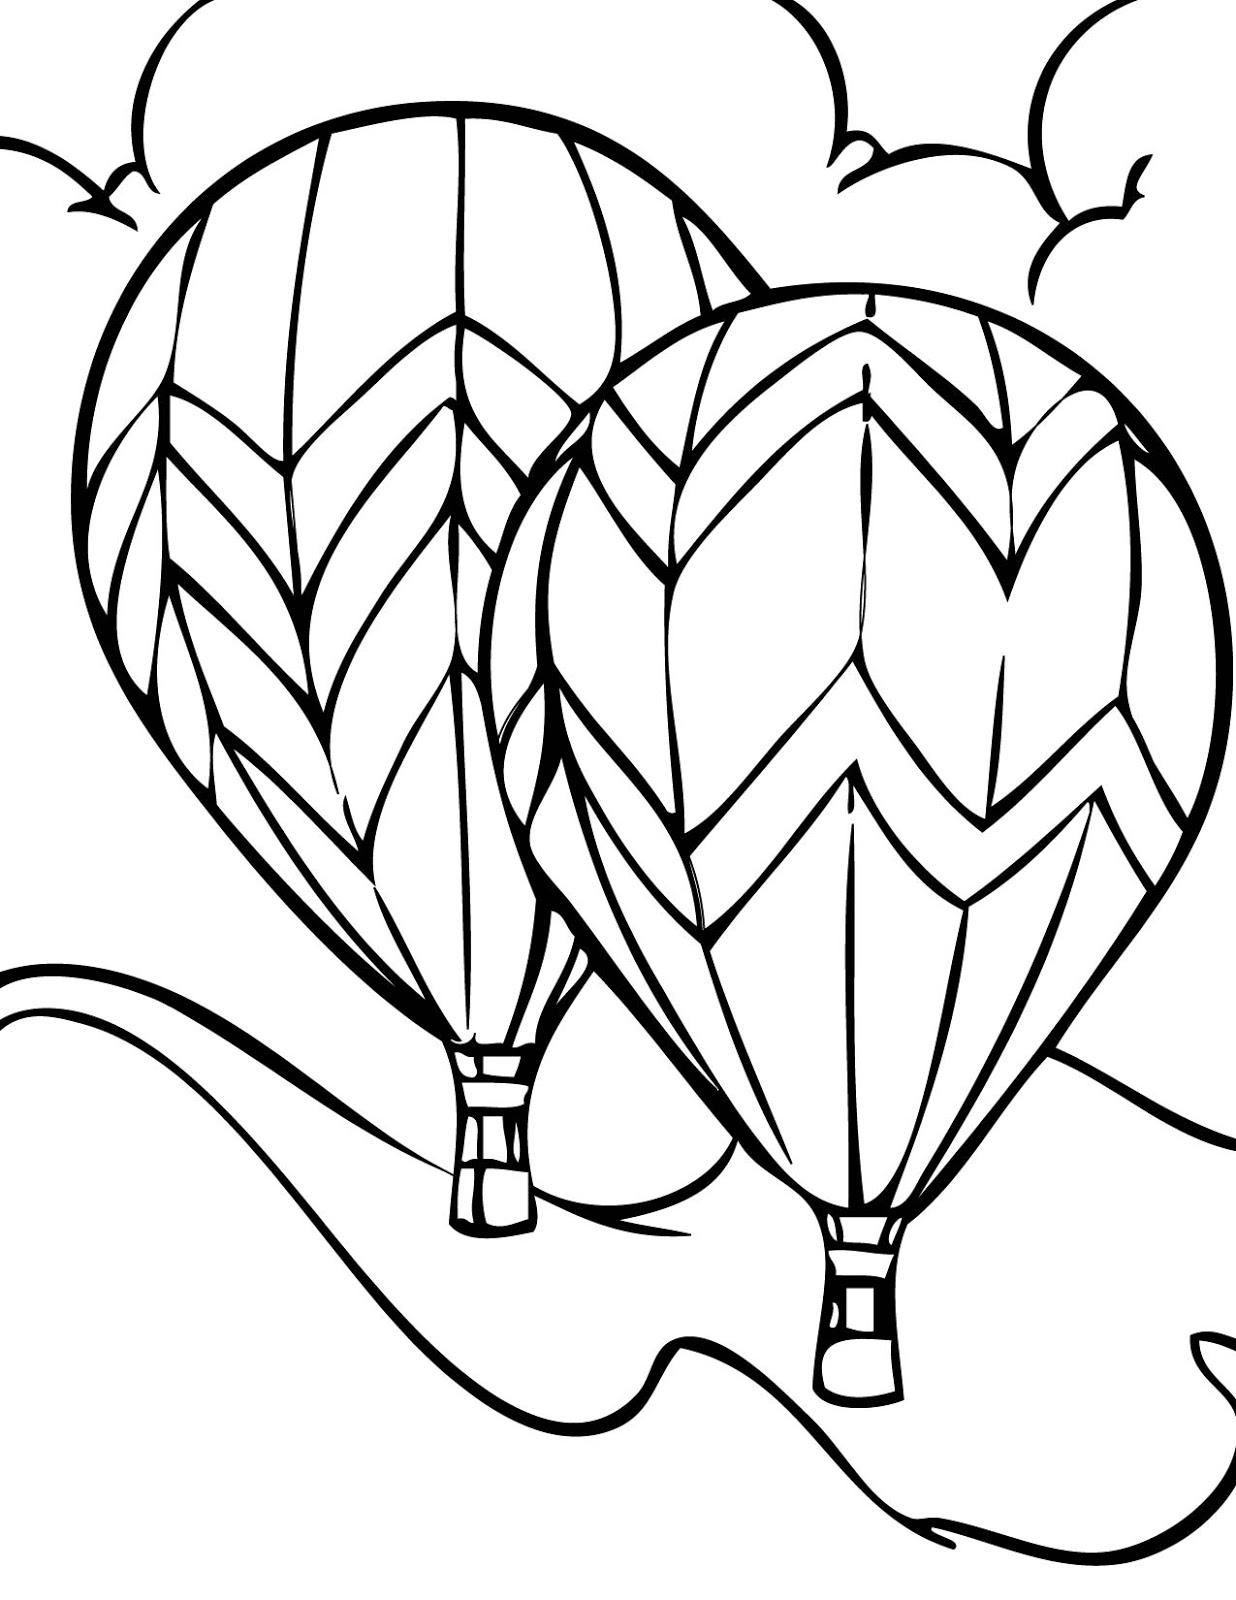 Transportation Coloring Sheets: Hot Air Balloons Coloring Pages